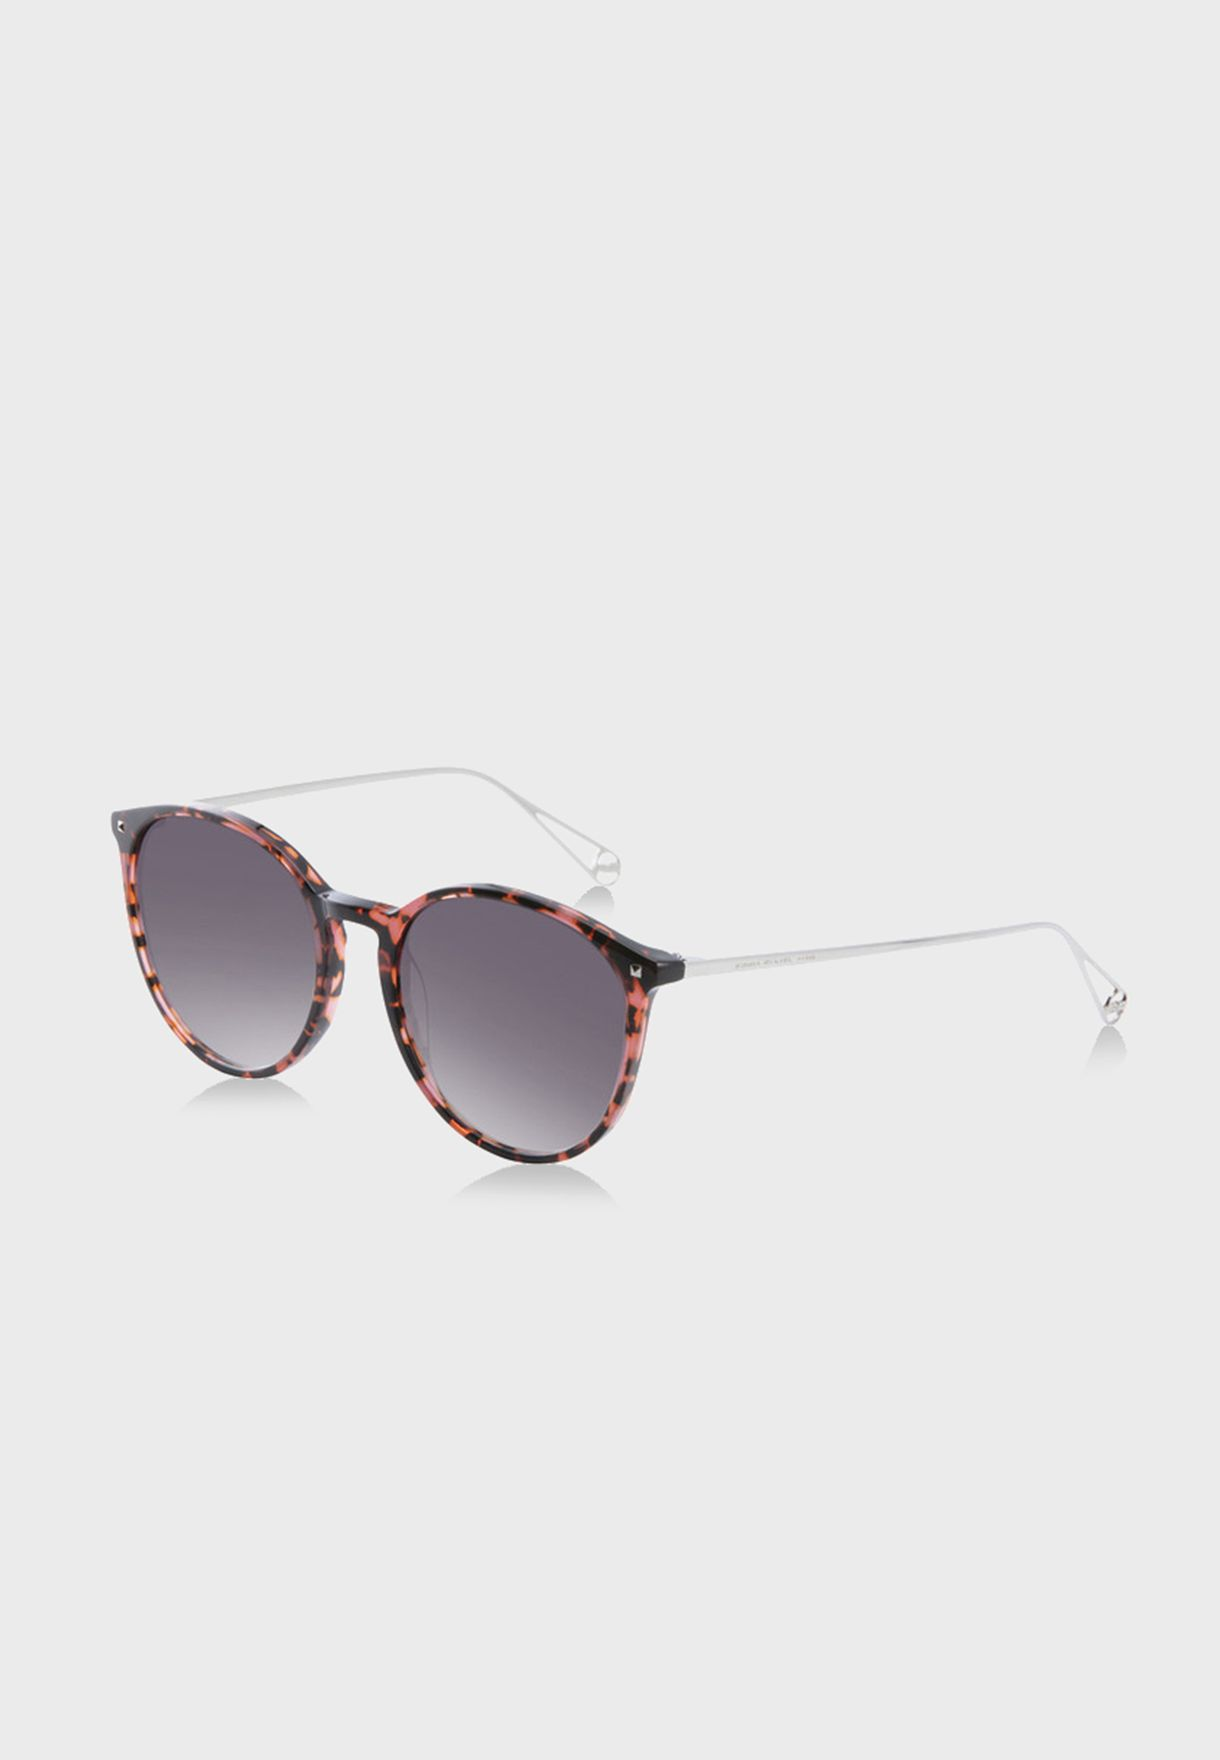 L SR777004 Cateye Sunglasses